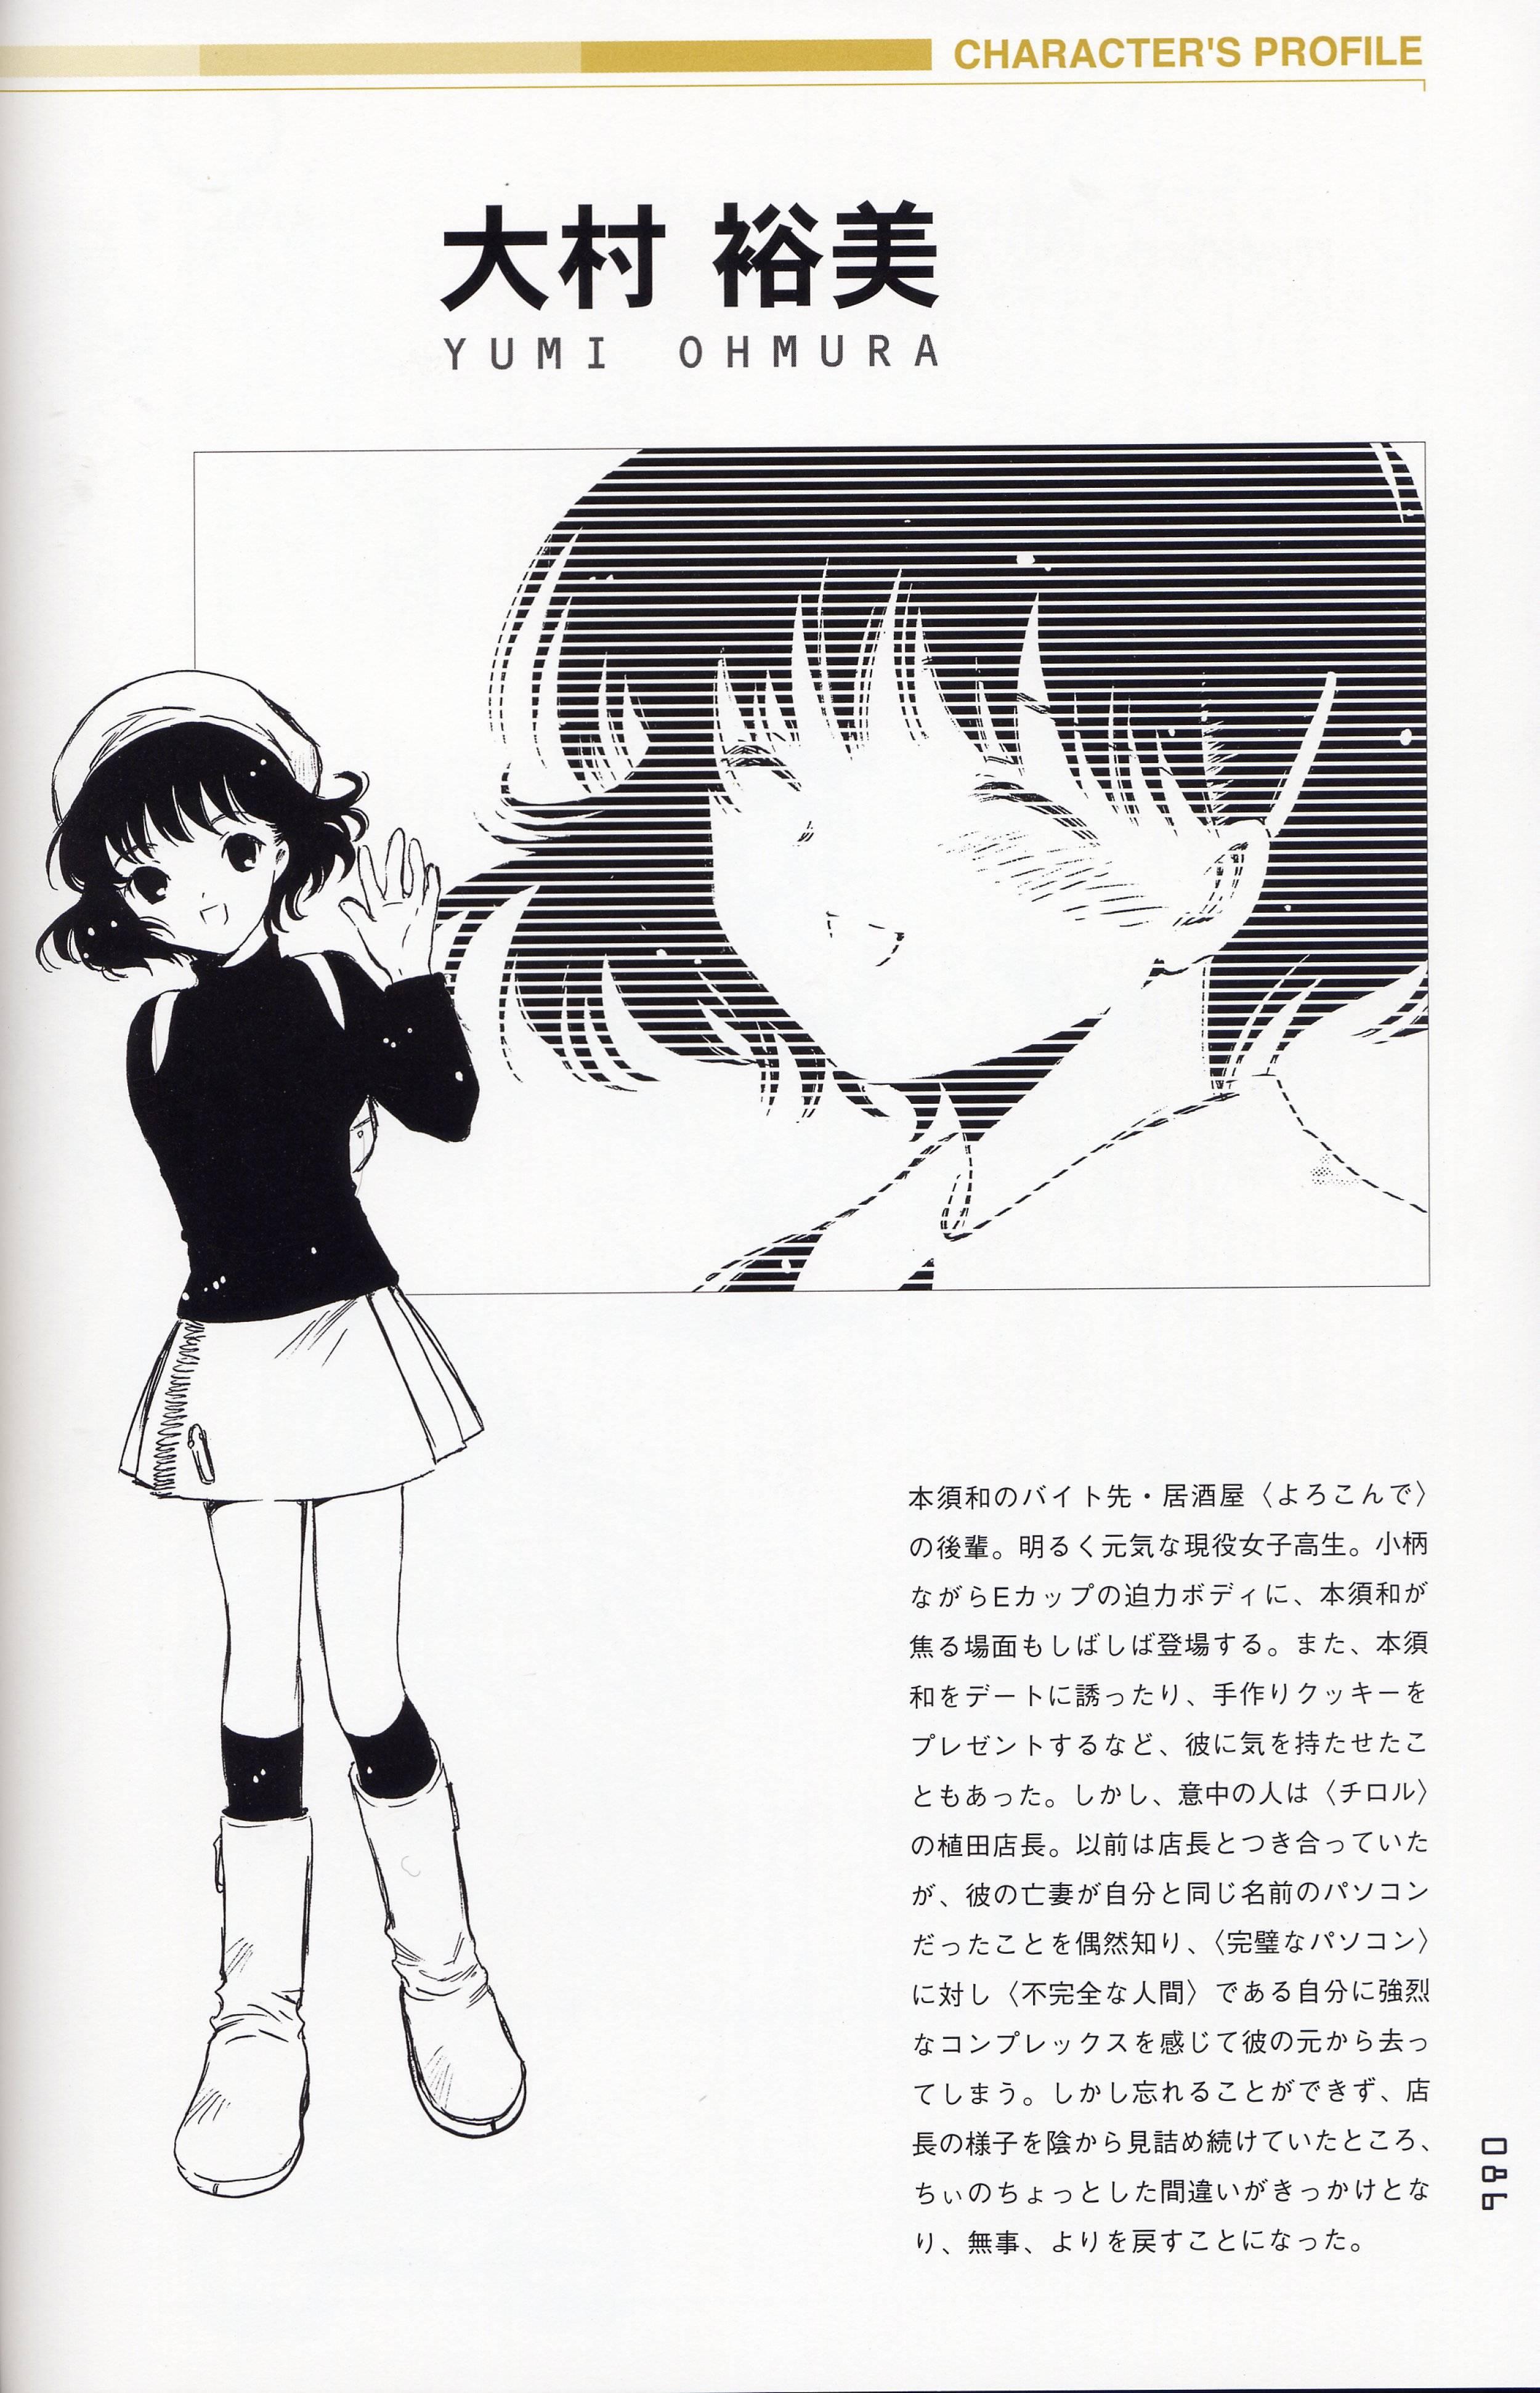 Chobits: Character Profiles Yumi - Minitokyo